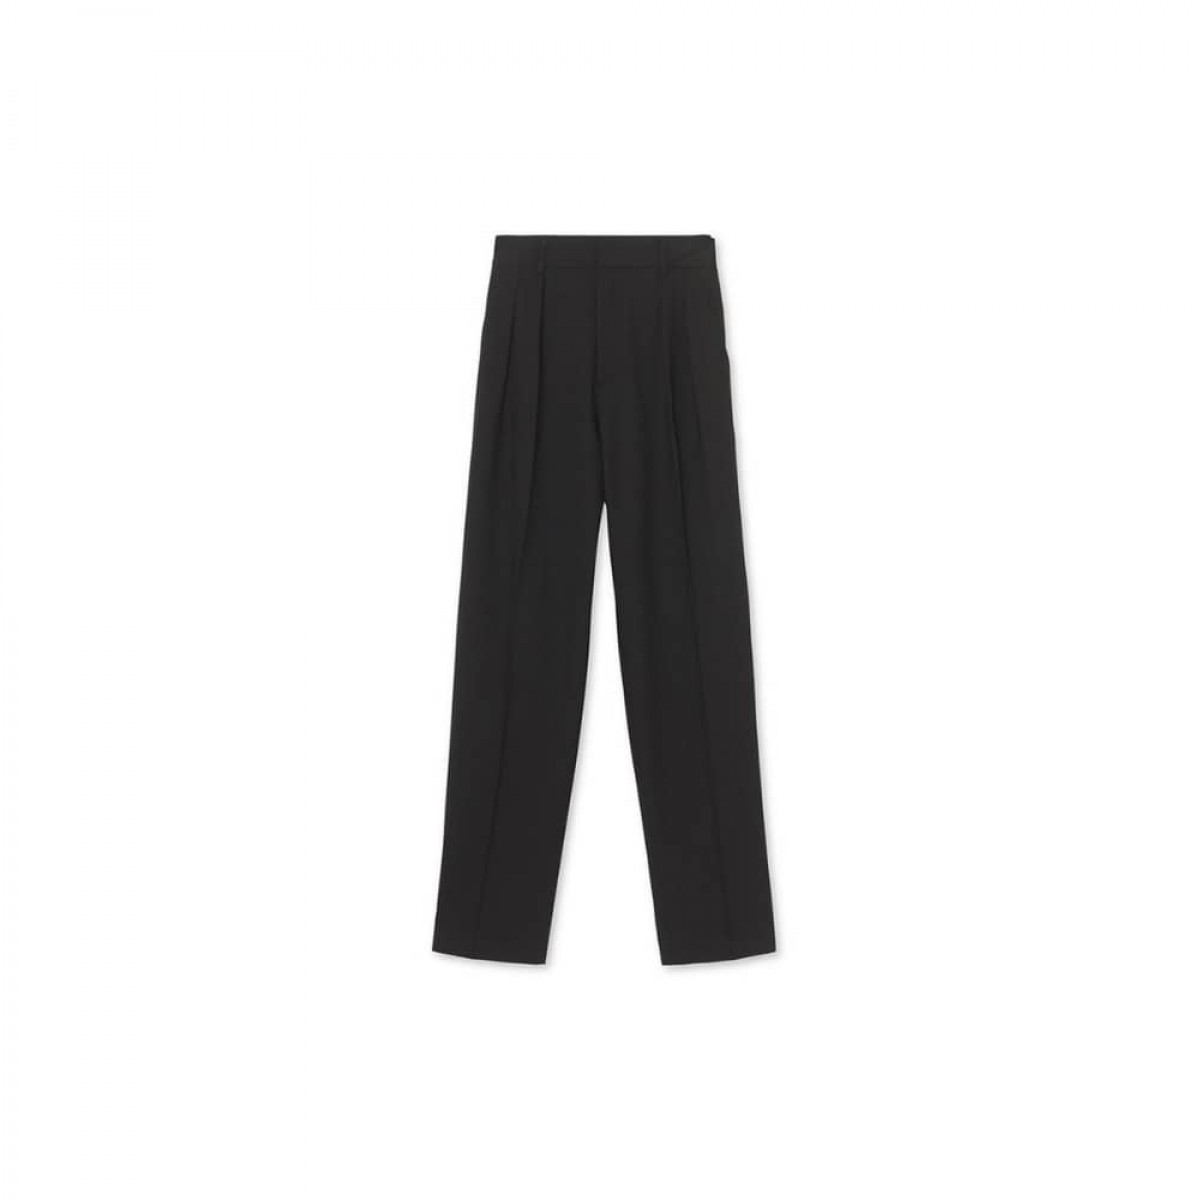 wilma pants - black - front